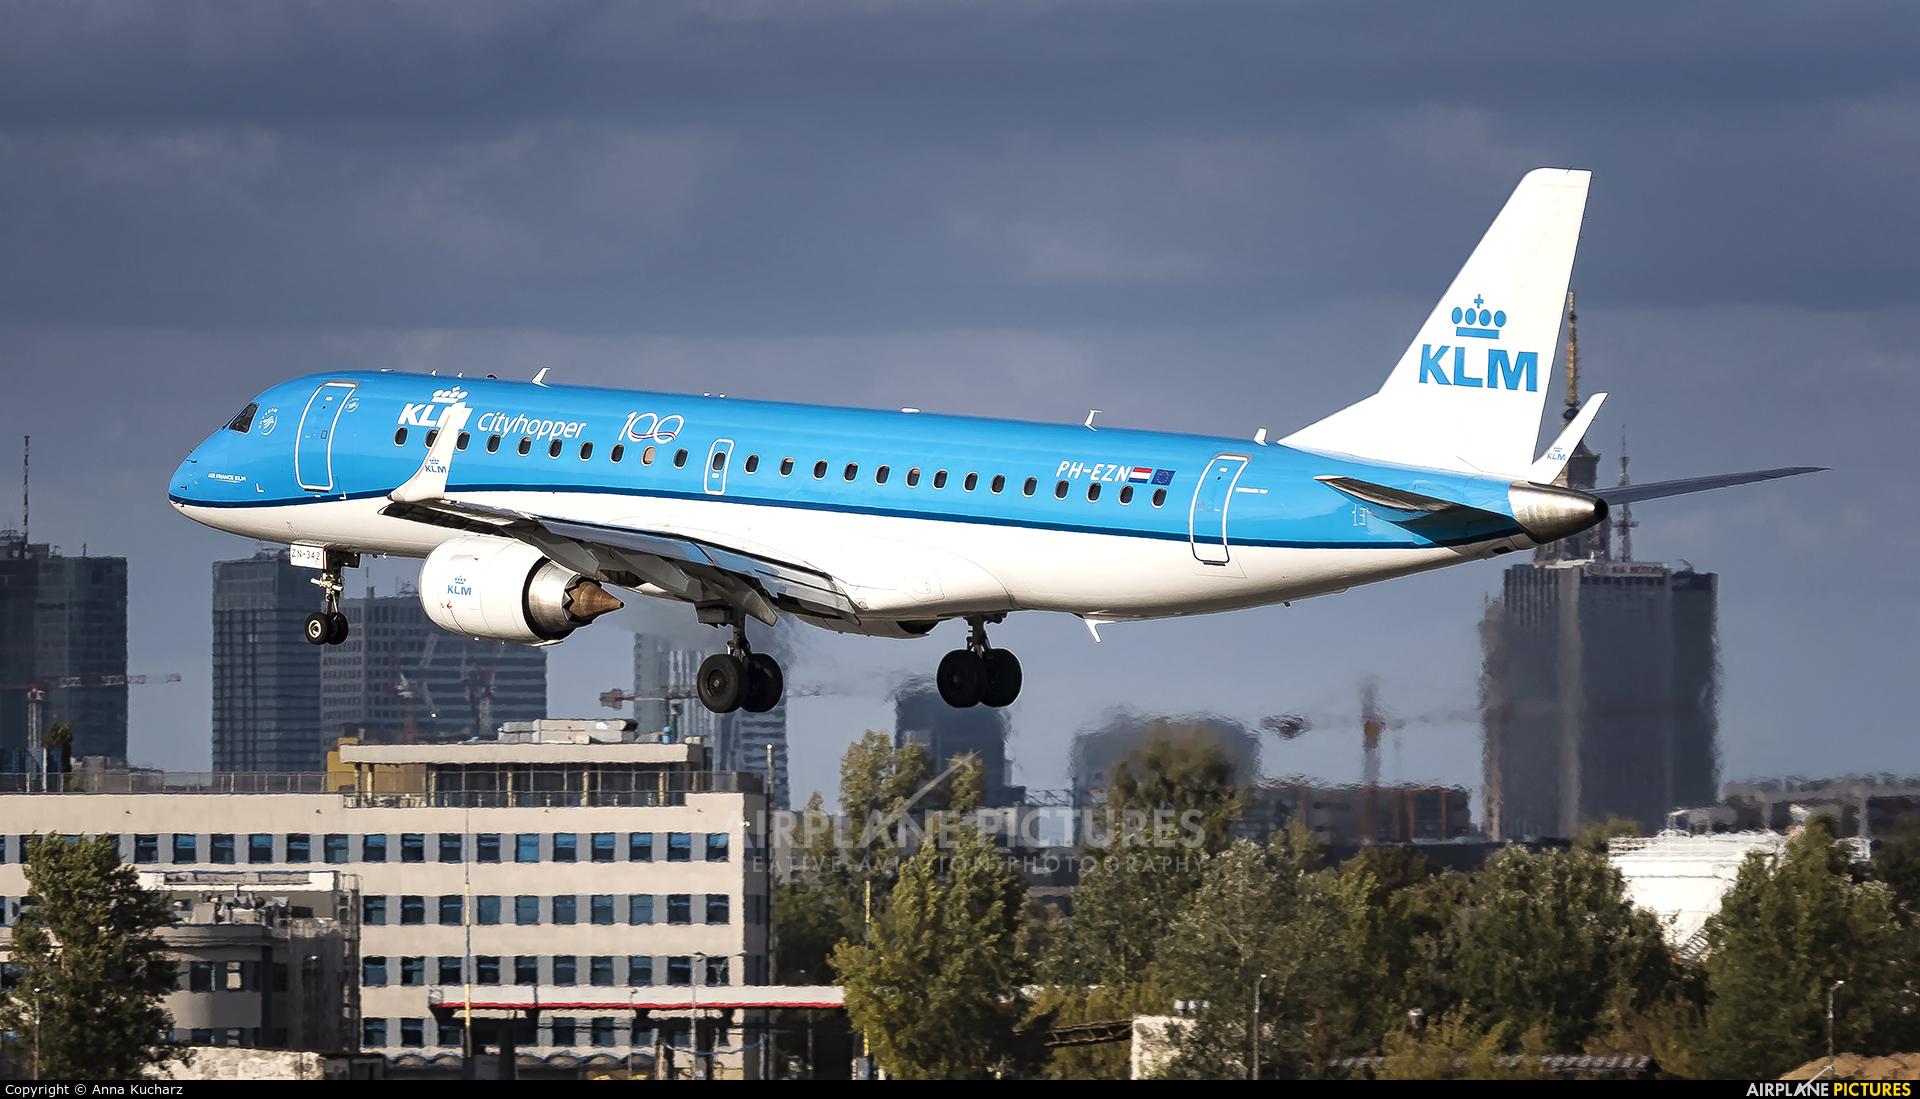 KLM Cityhopper PH-EZN aircraft at Warsaw - Frederic Chopin